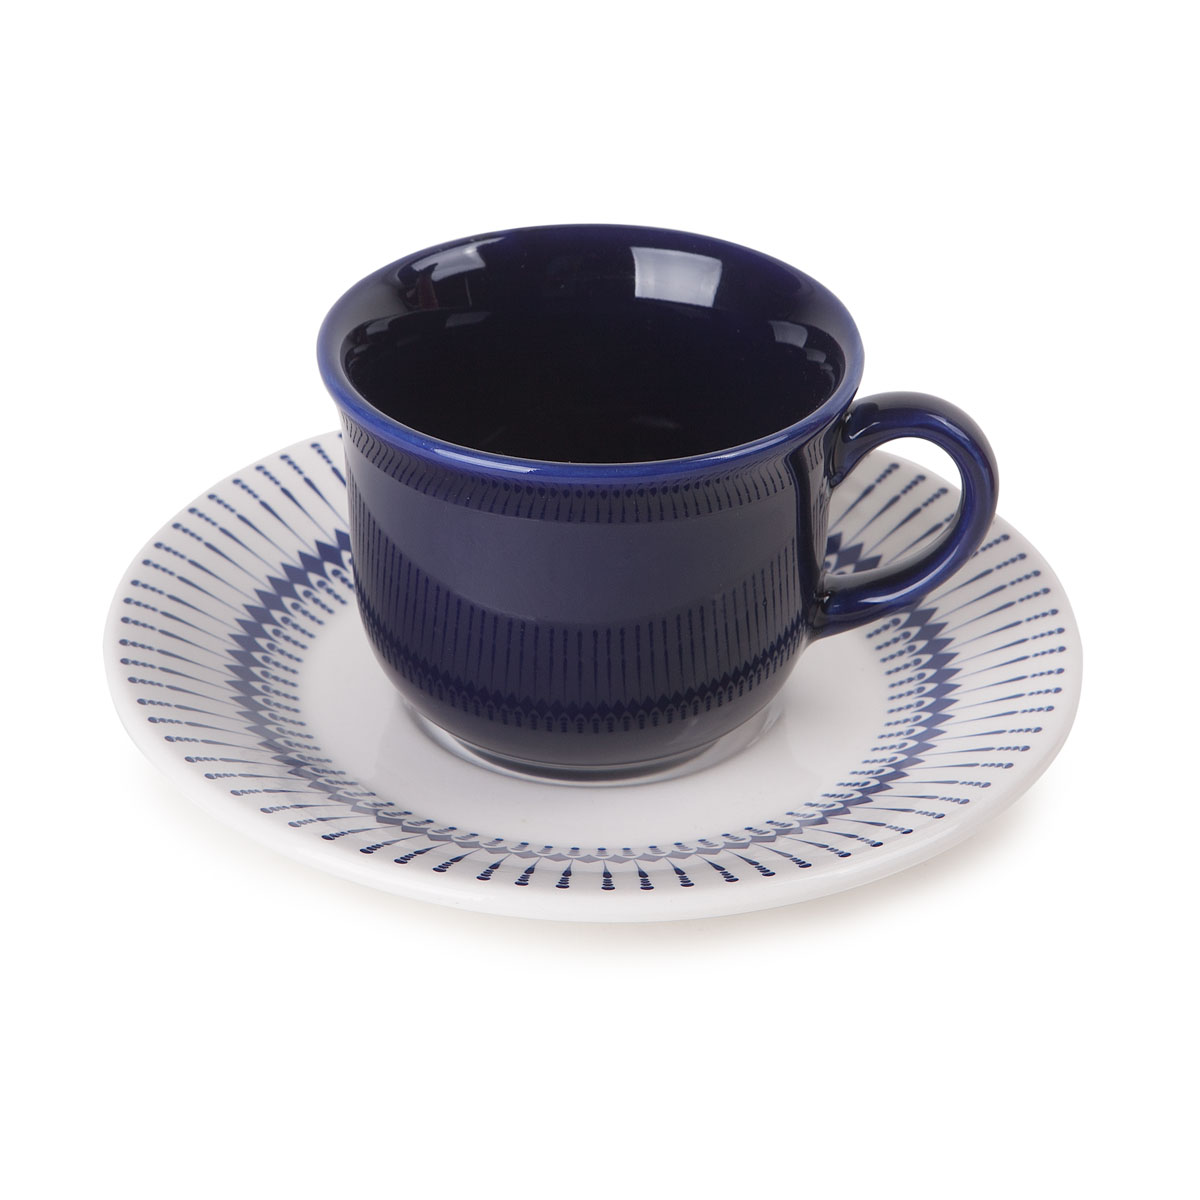 Xícara de Chá 200ml Com Pires 16cm Biona Actual Colb Oxford